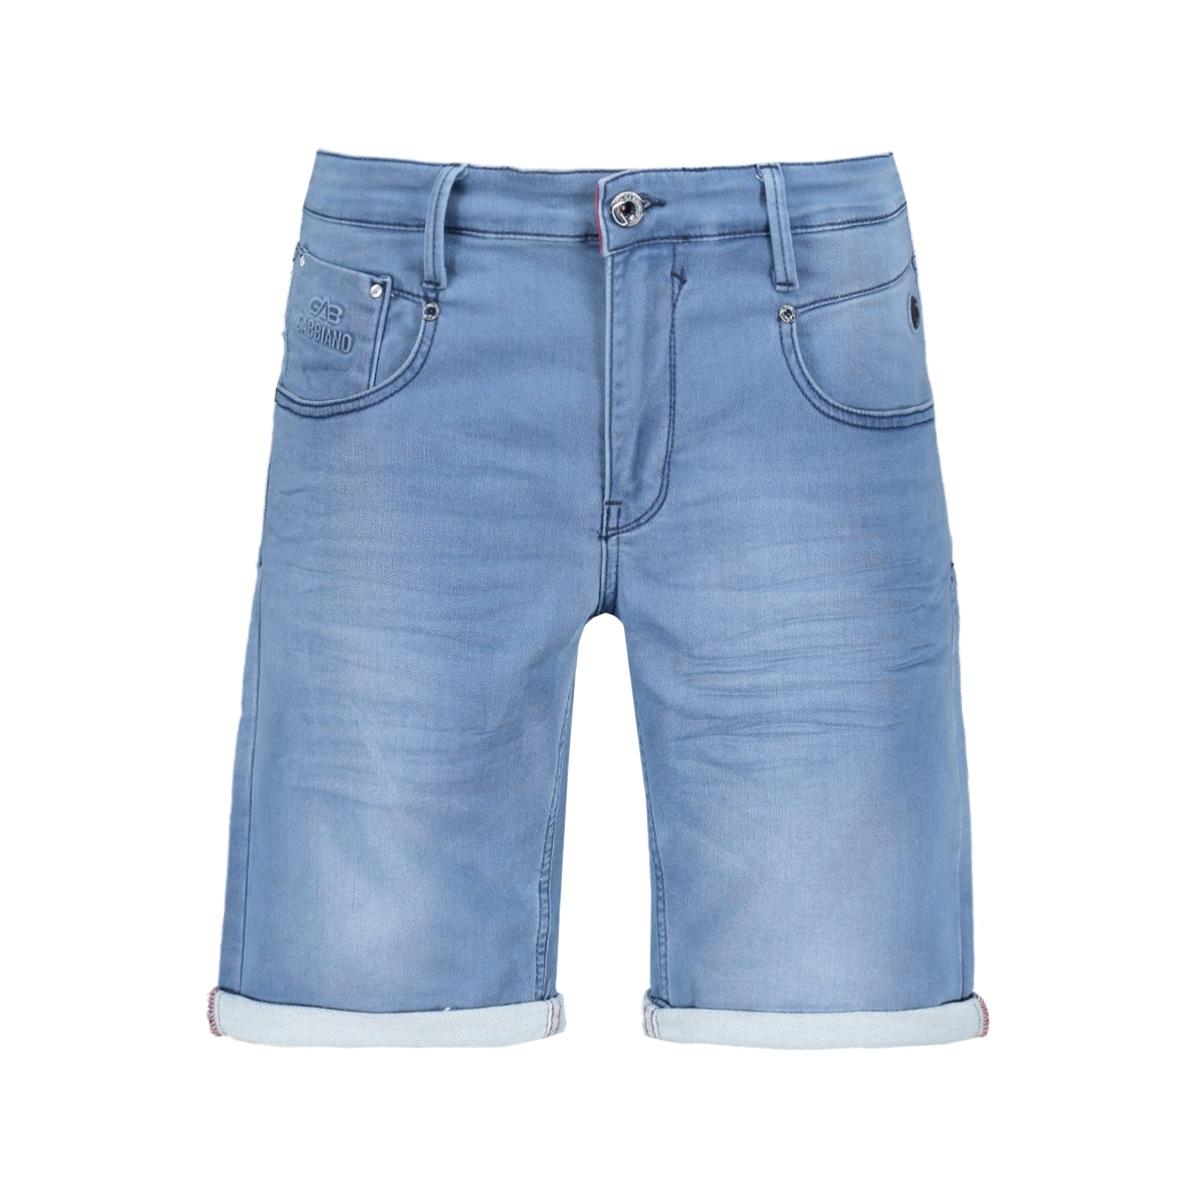 rimini short jogg jeans gabbiano korte broek bleach